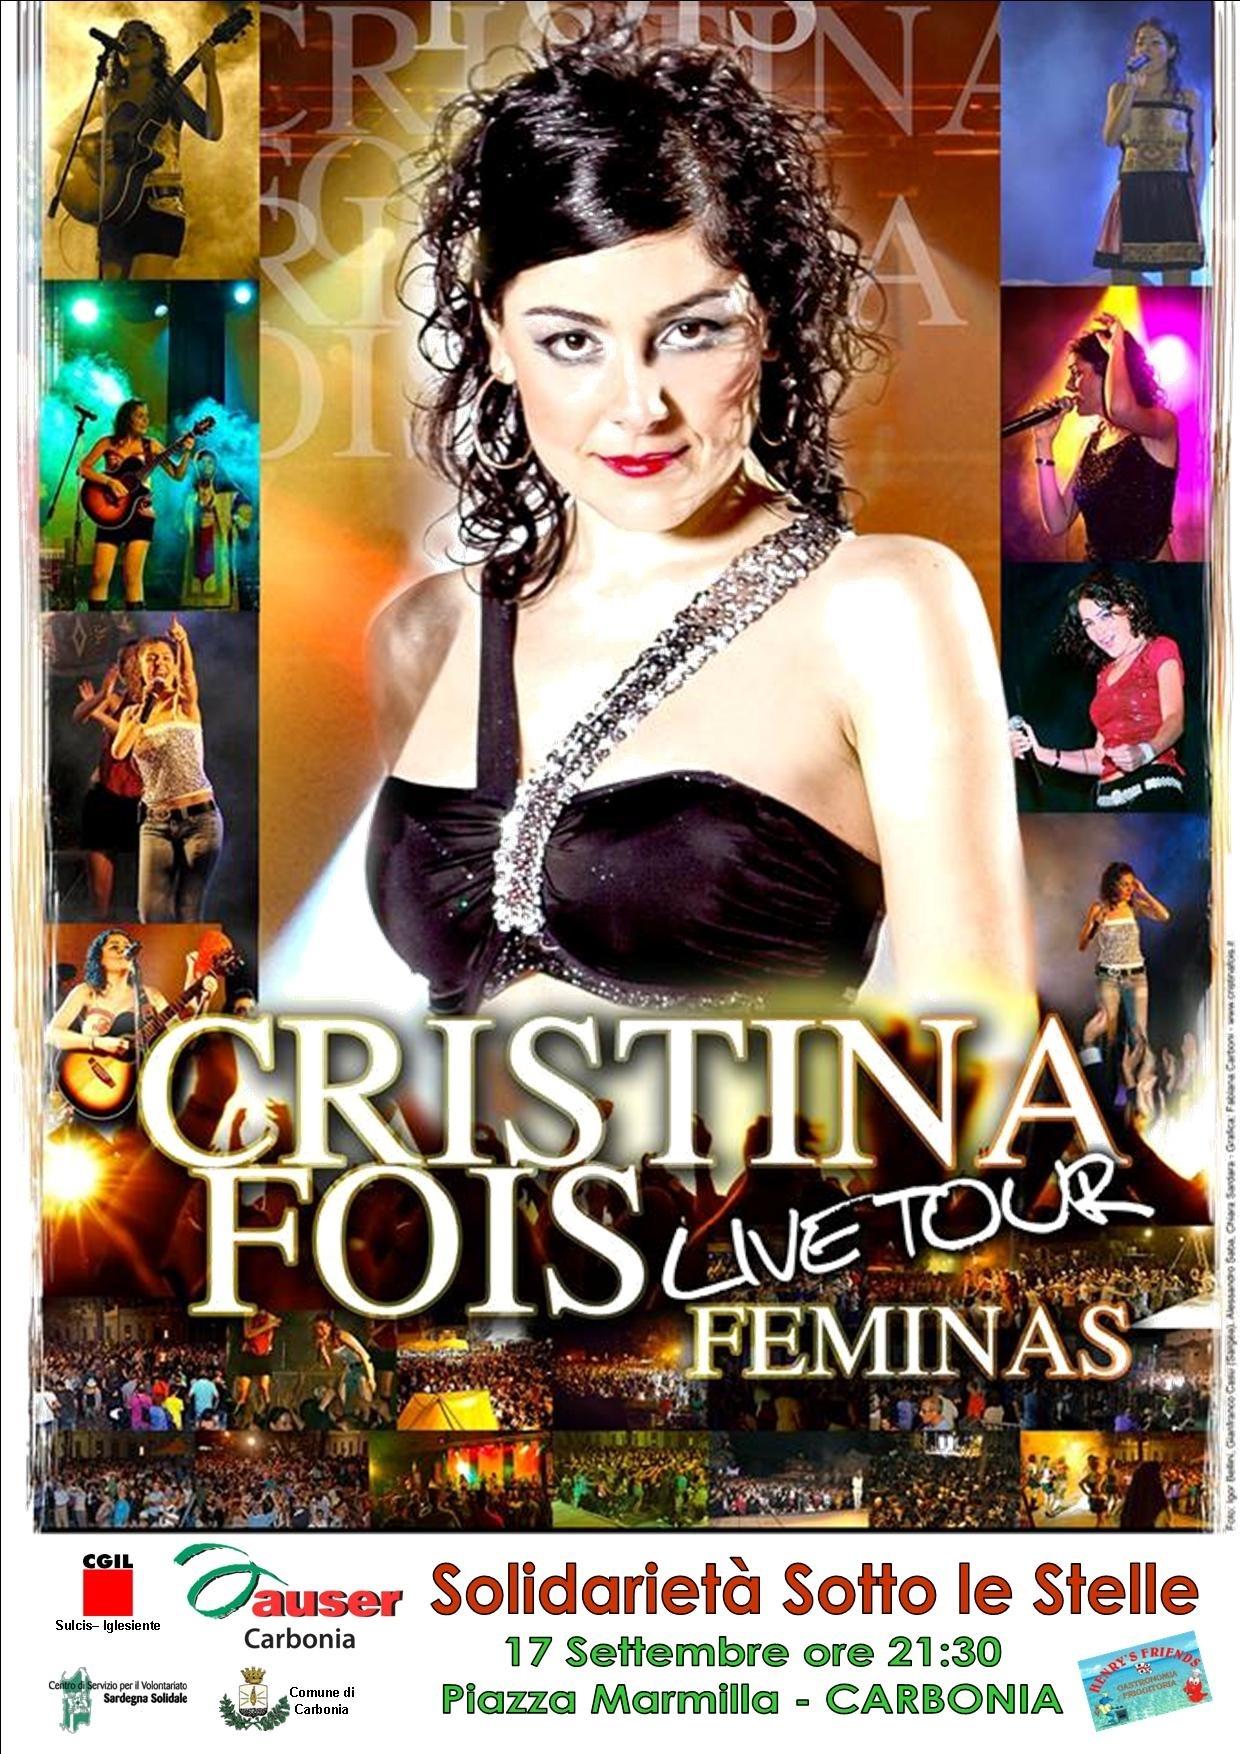 Cristina Fois live Tour Feminas Piazza Marmilla 17 settembre Carbonia.